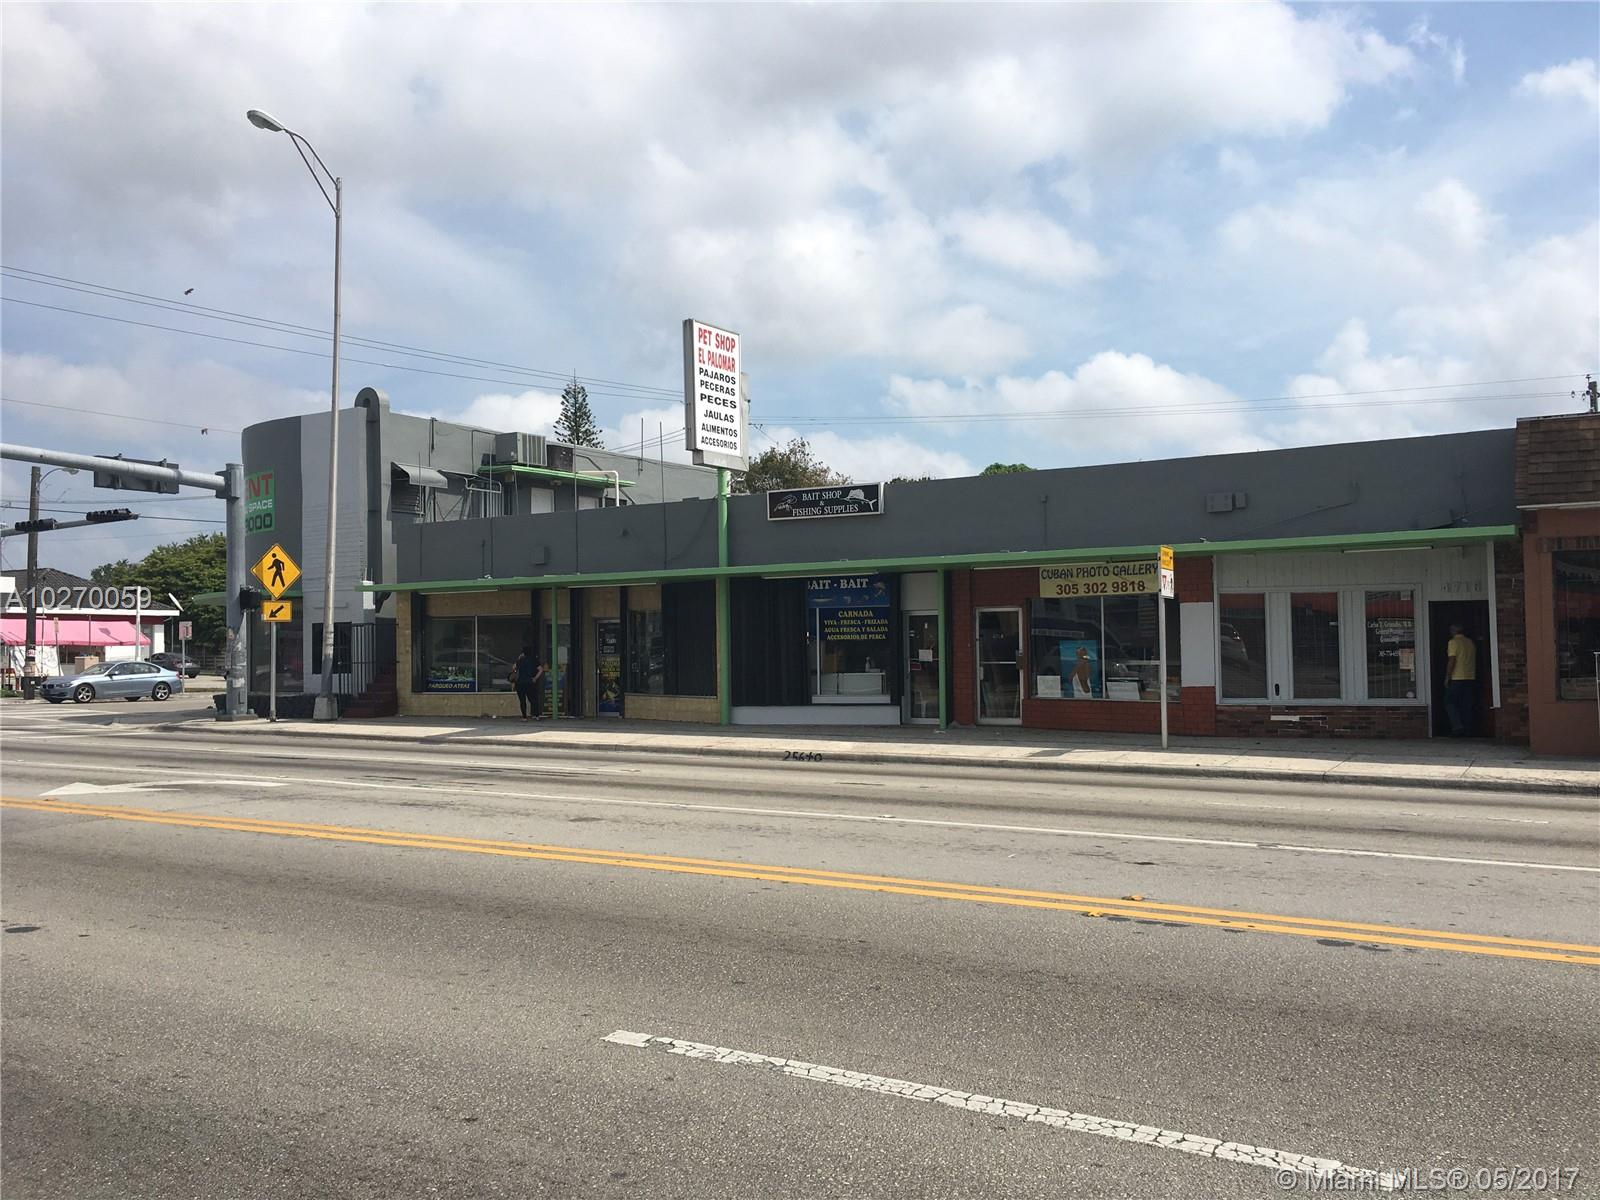 4700 W Flagler St # 4700, Miami, FL 33134